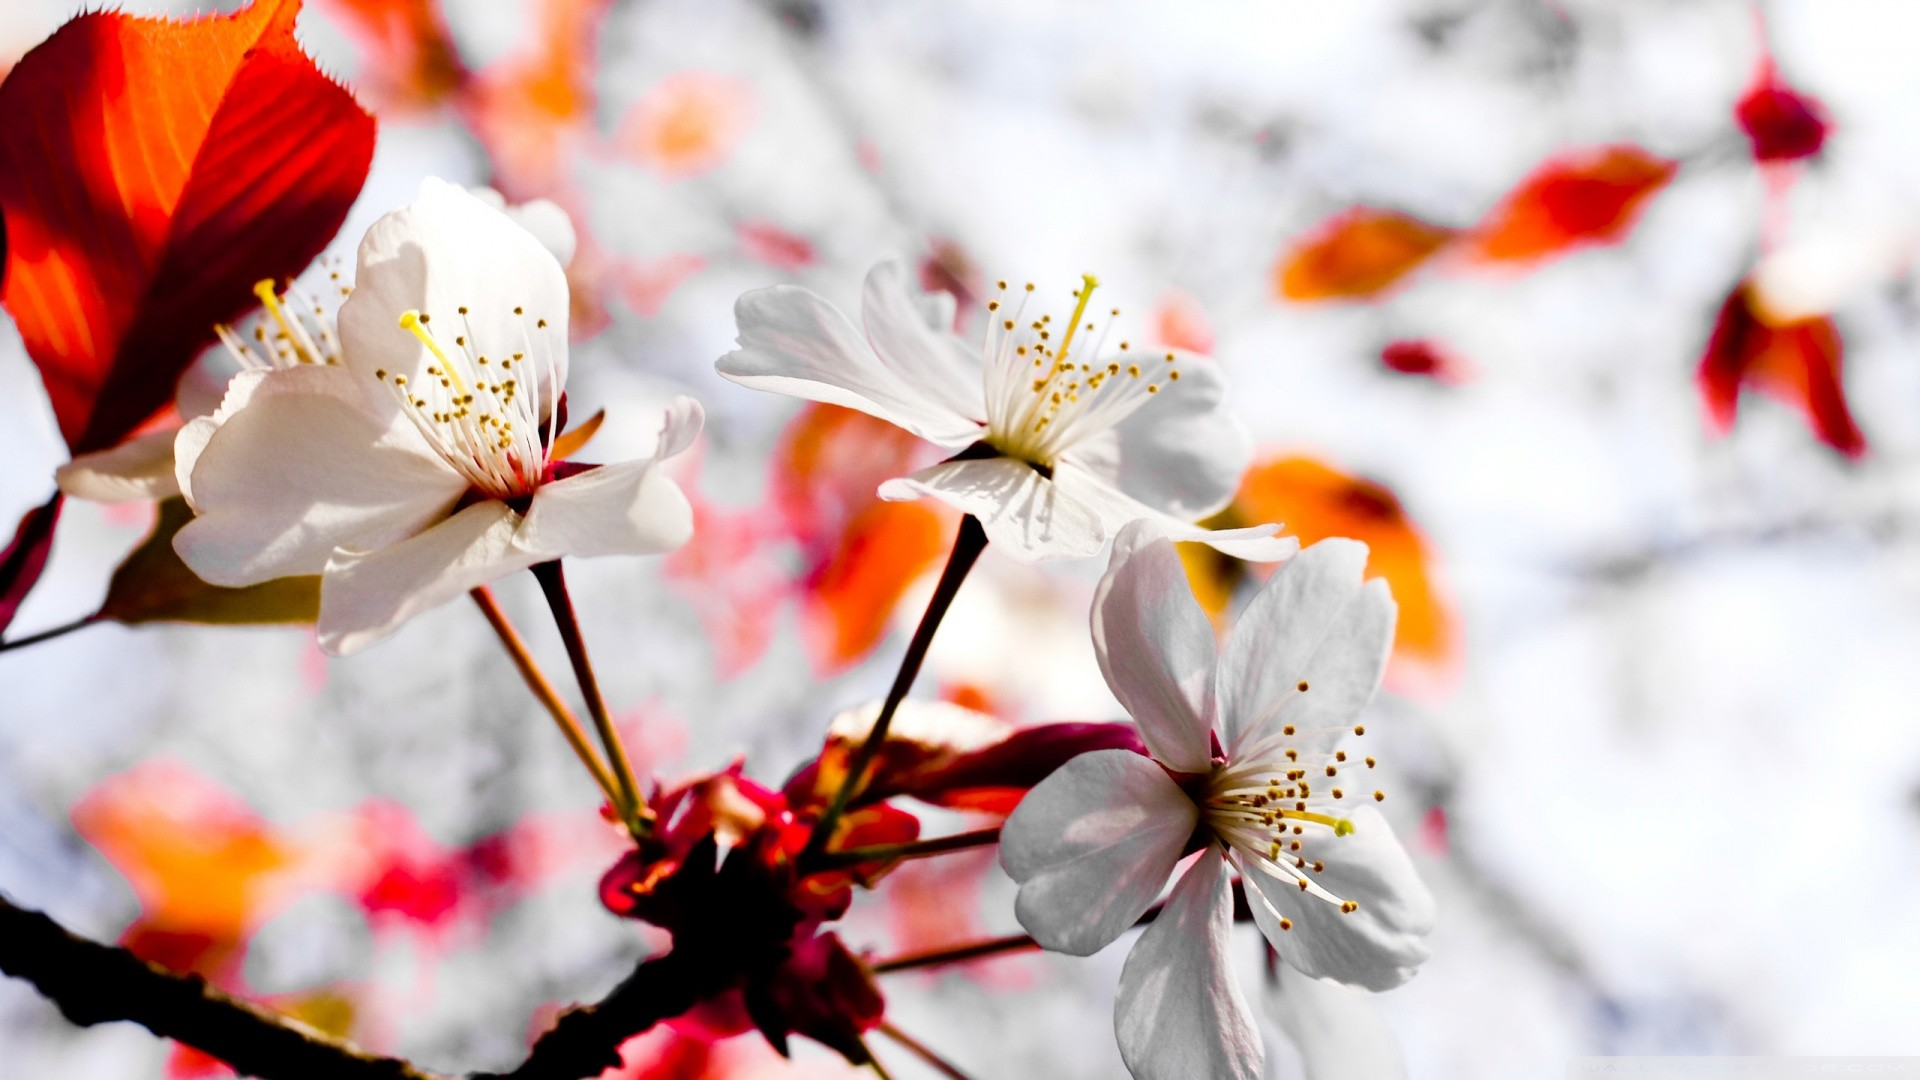 April-Spring-Flowers-Desktop-Wallpaper